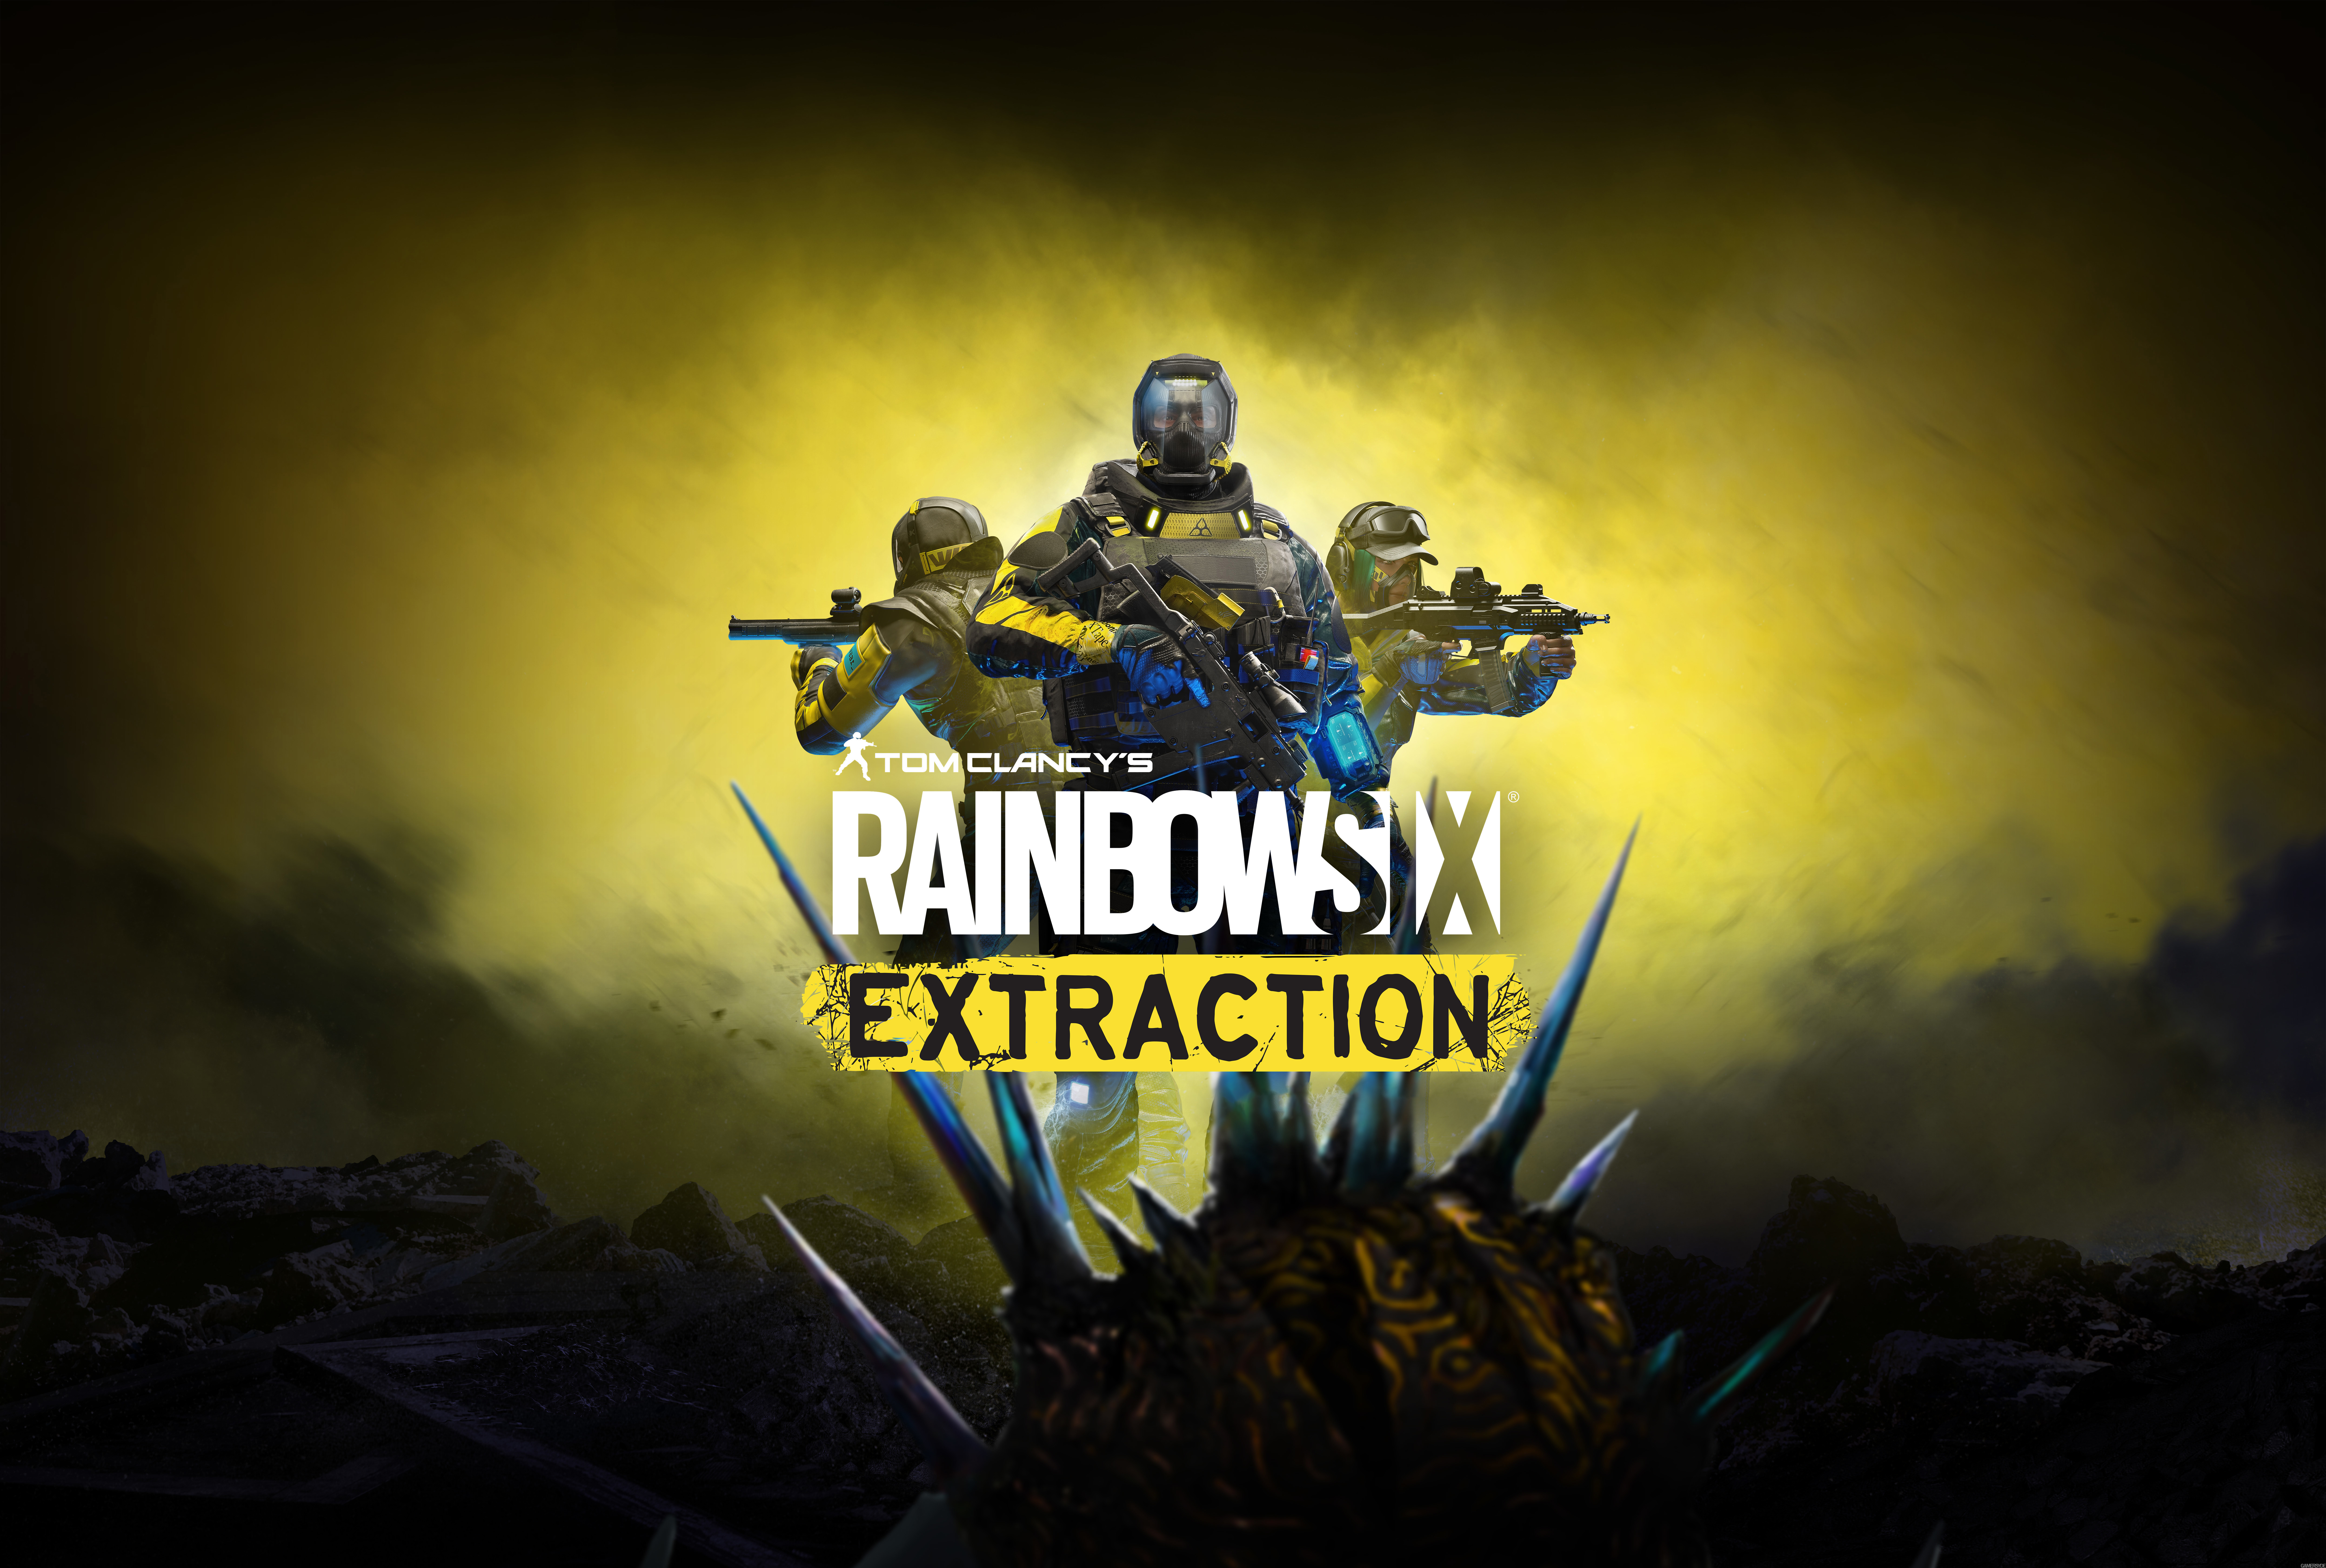 Fondos de pantalla Tom Clancy's Rainbow Six Extraction